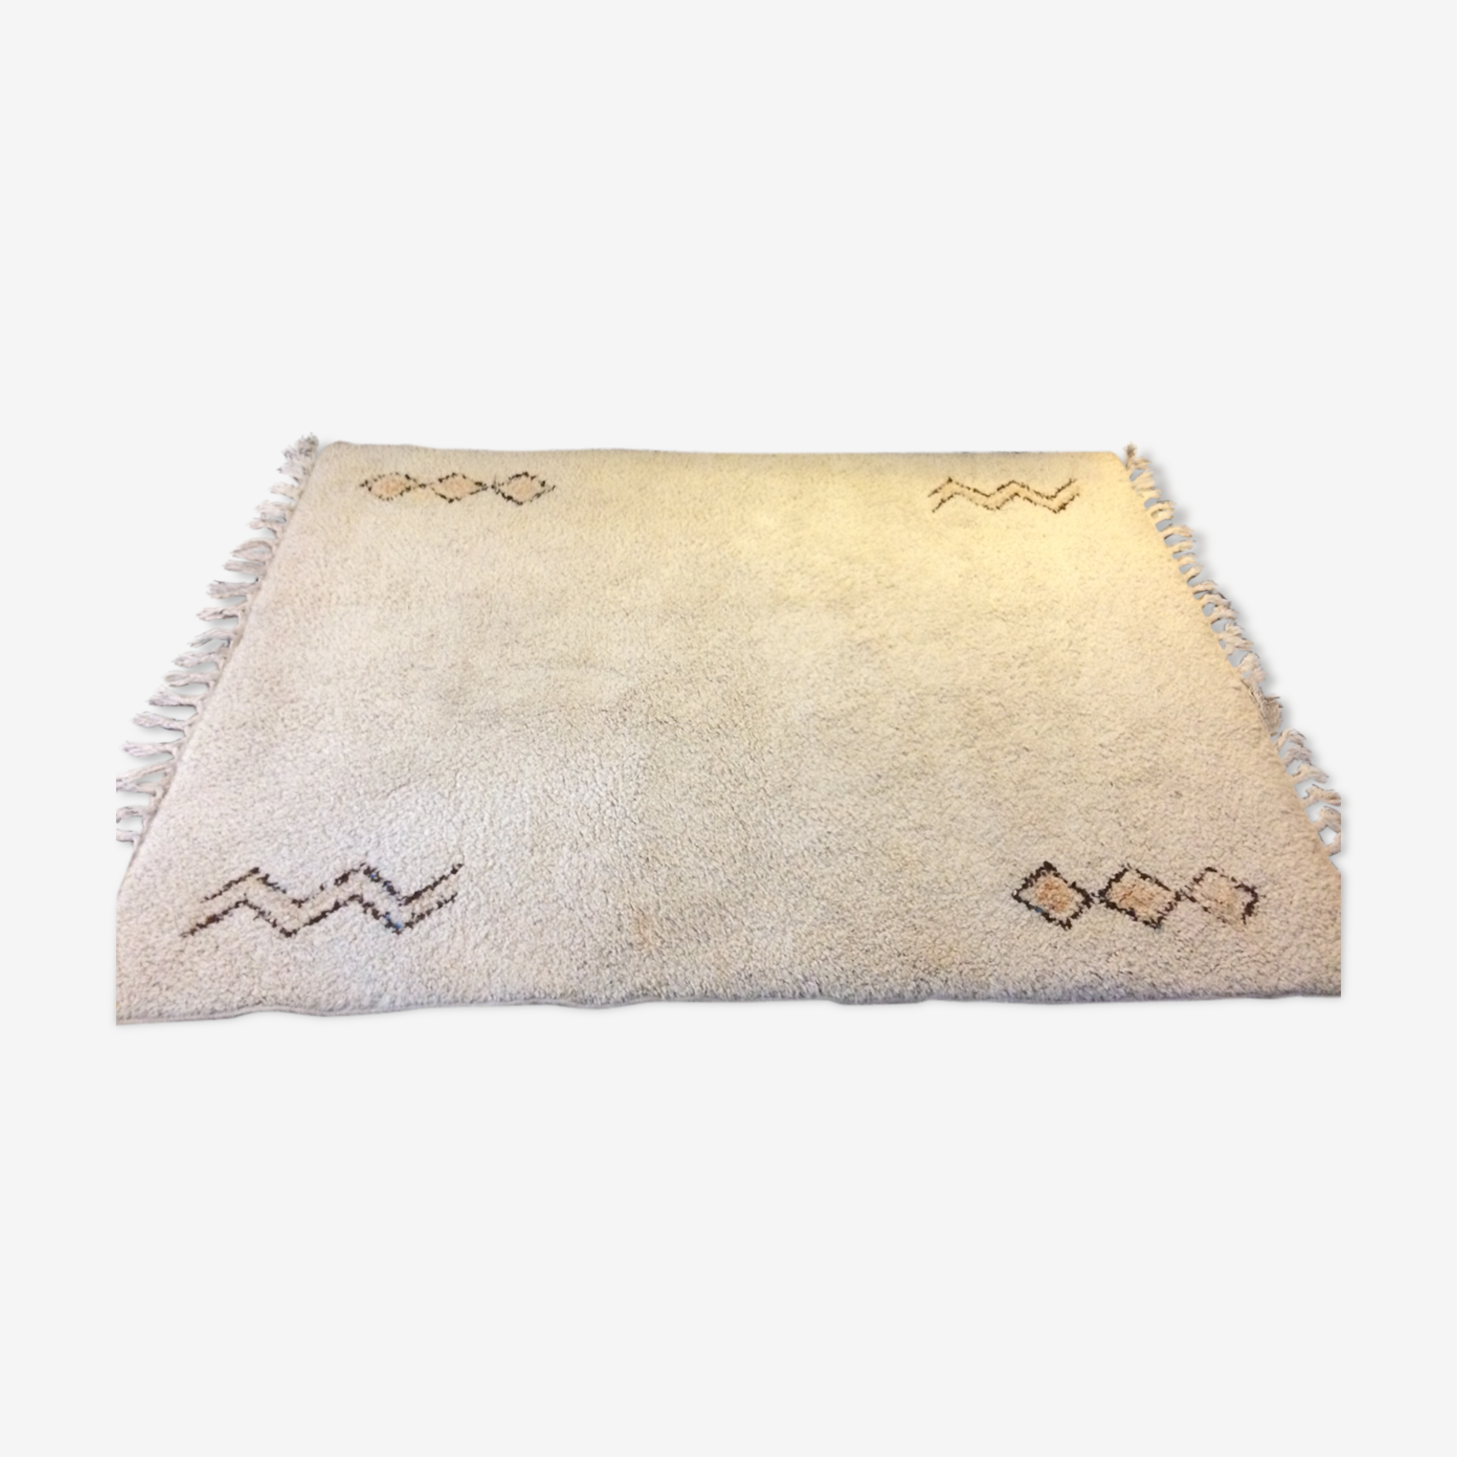 Tapis berbère 155 x 220 cm